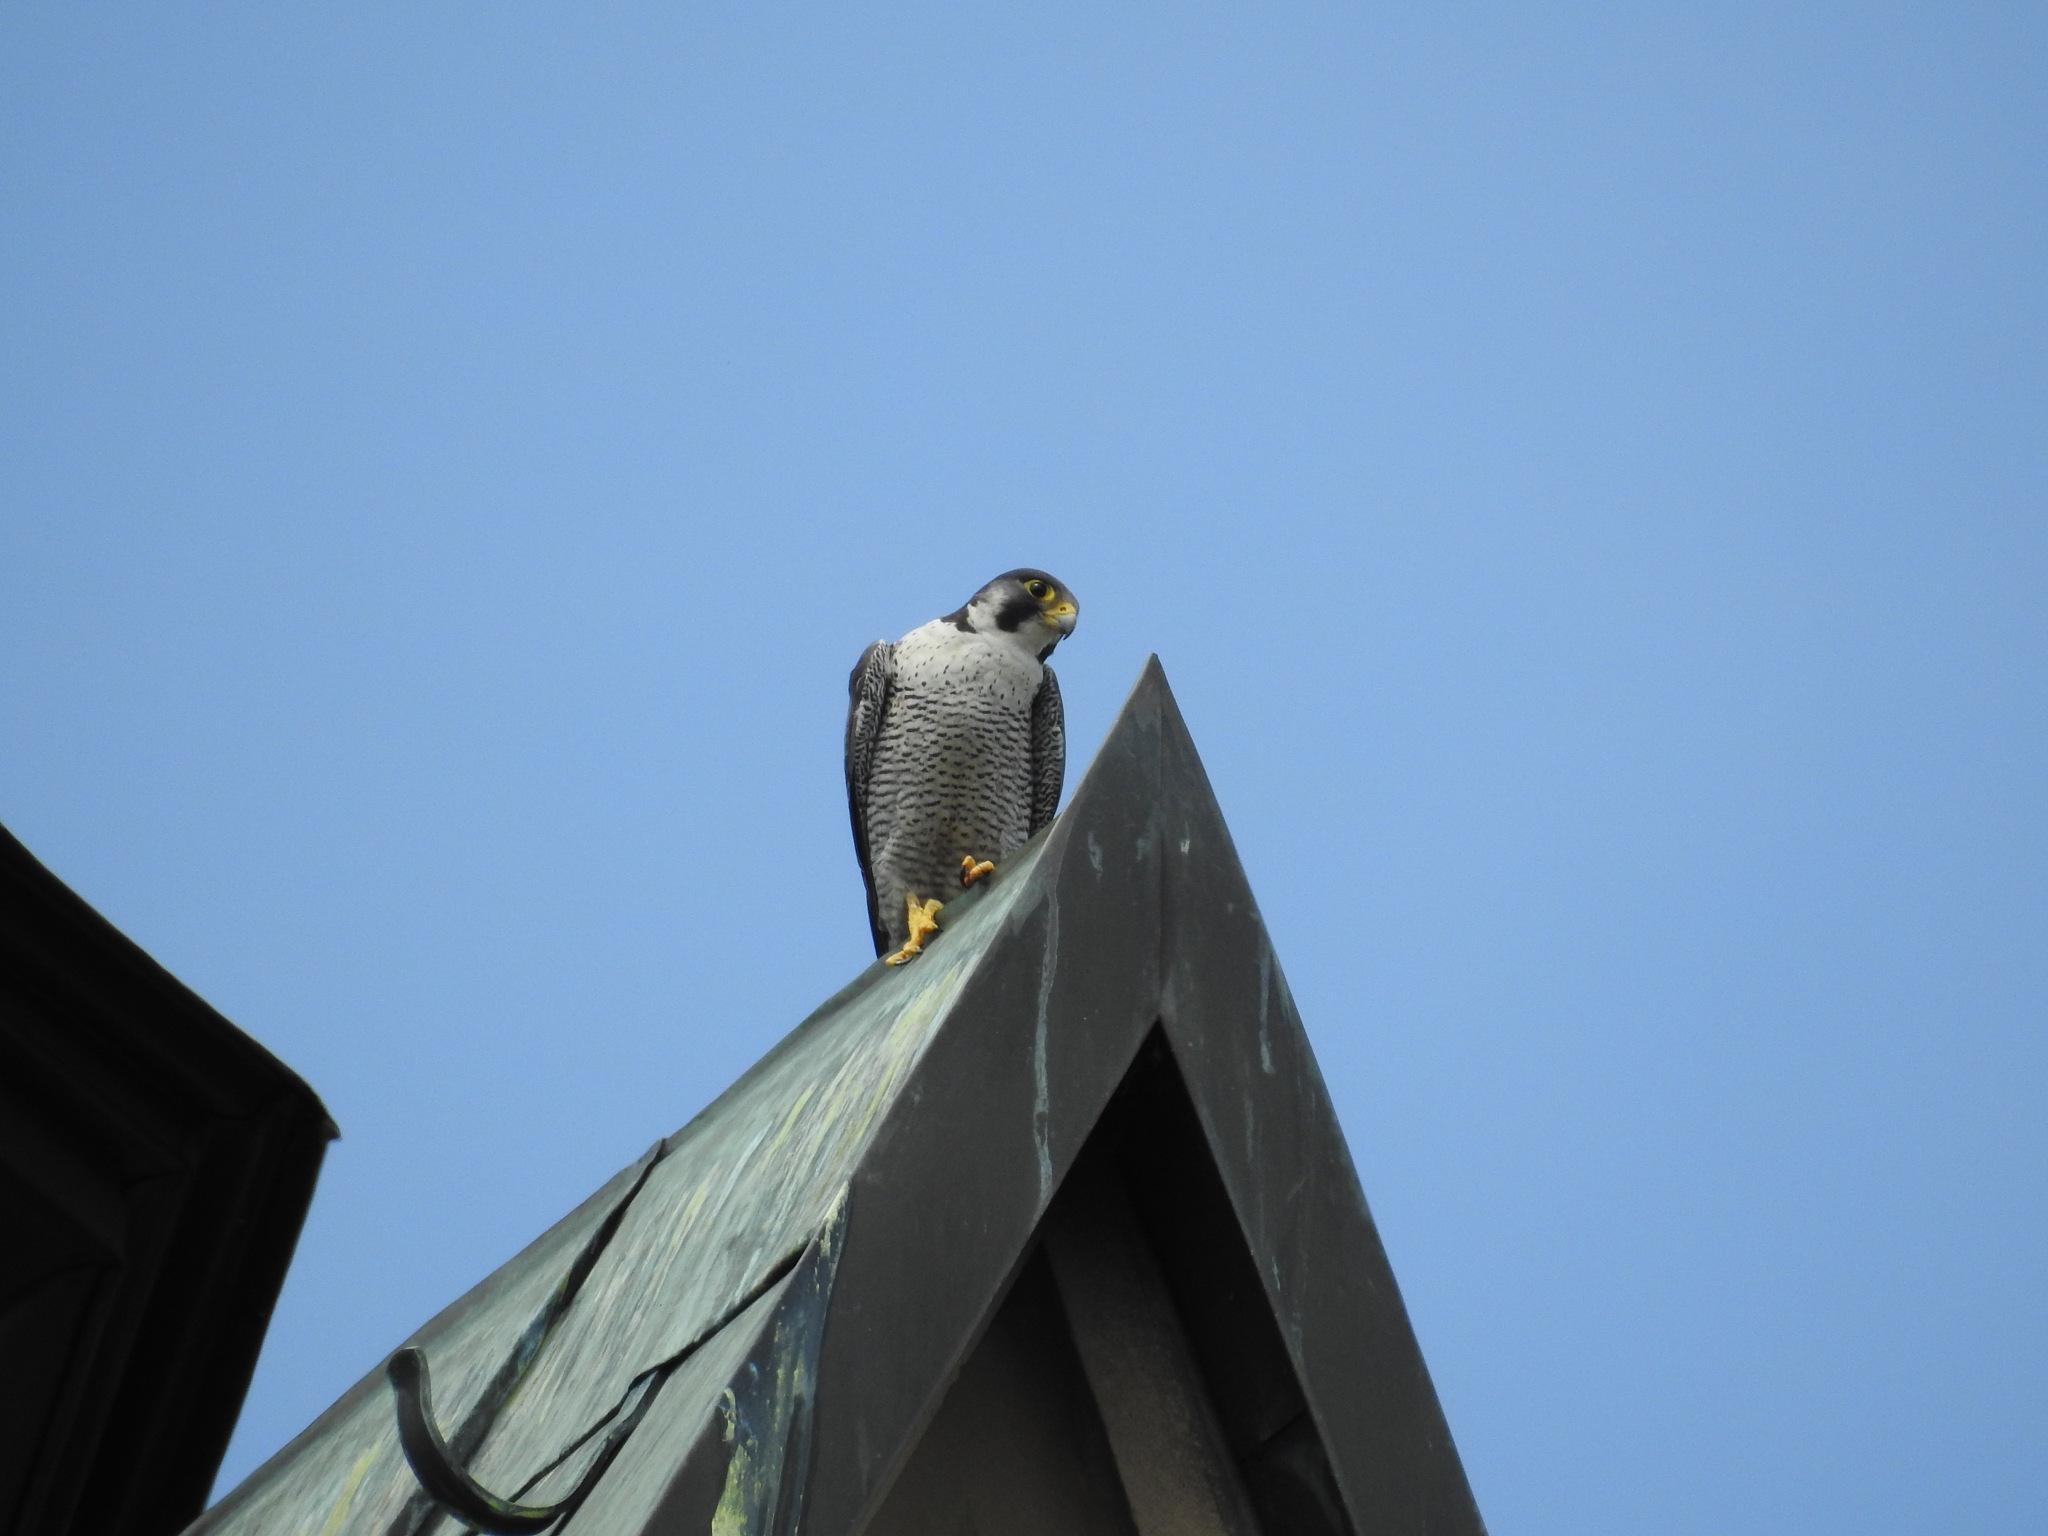 Female Peregrine falcon by Jochen Roth